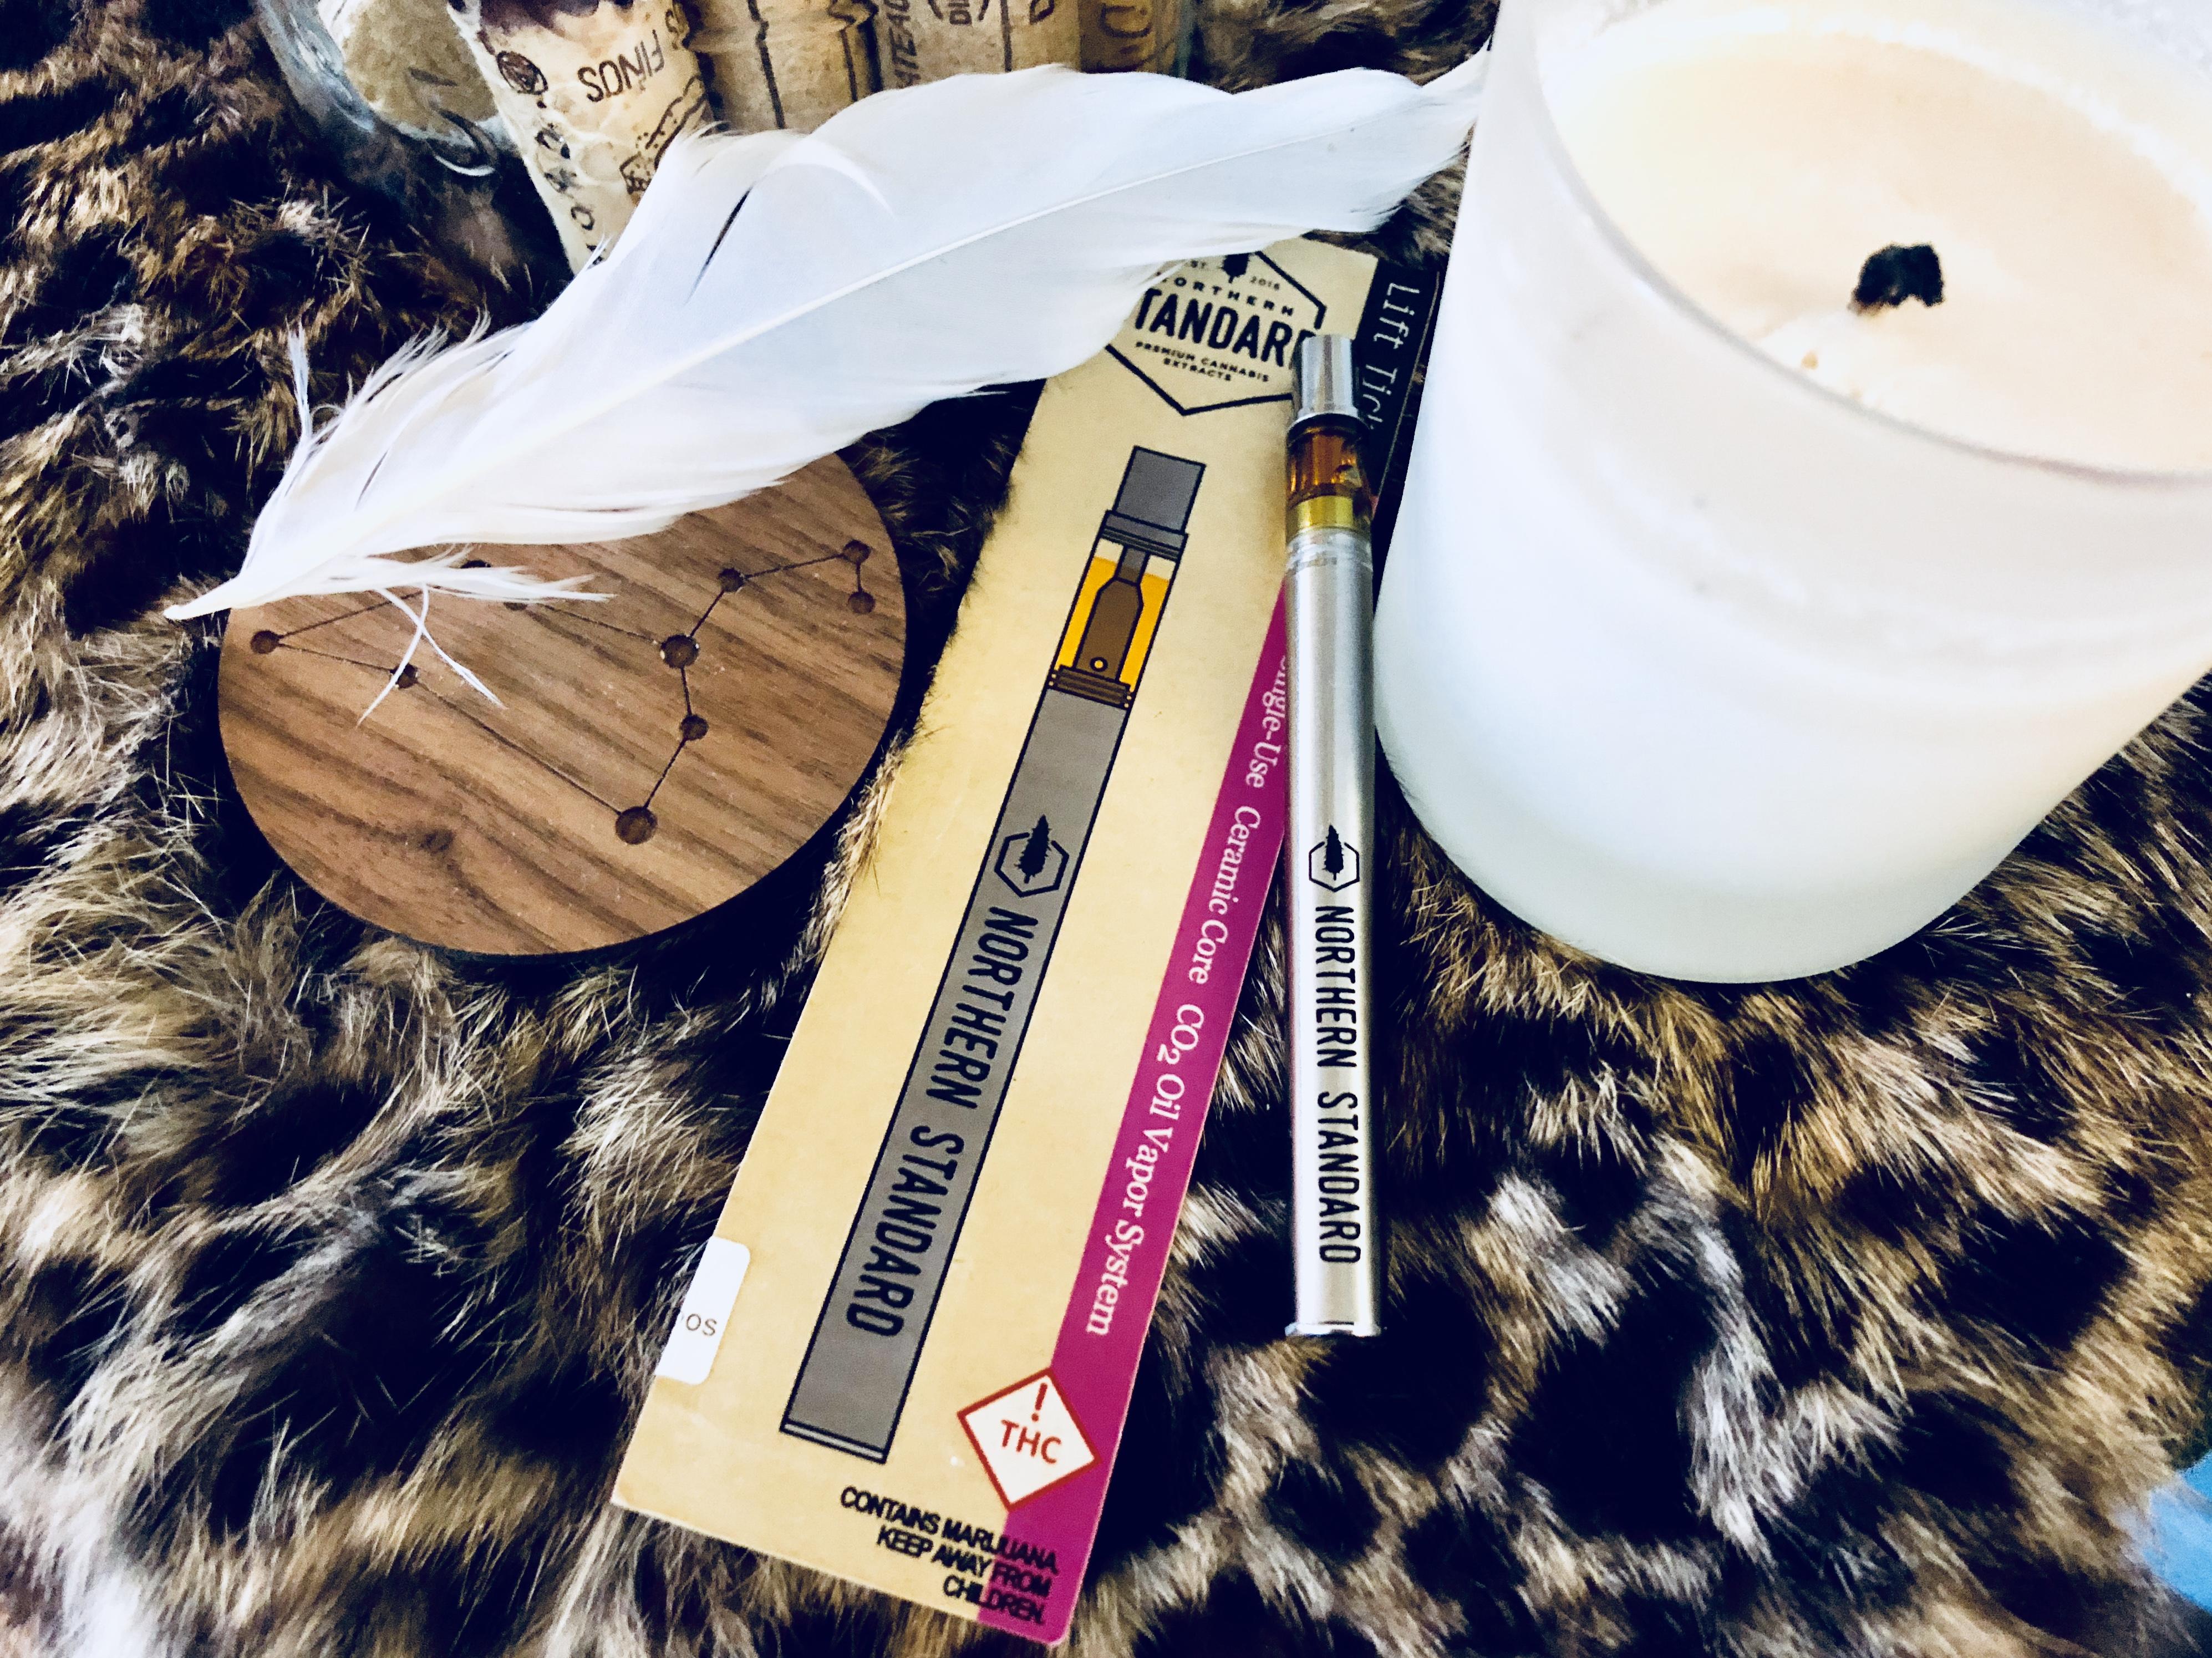 Review: CBD/THC Vape Pen